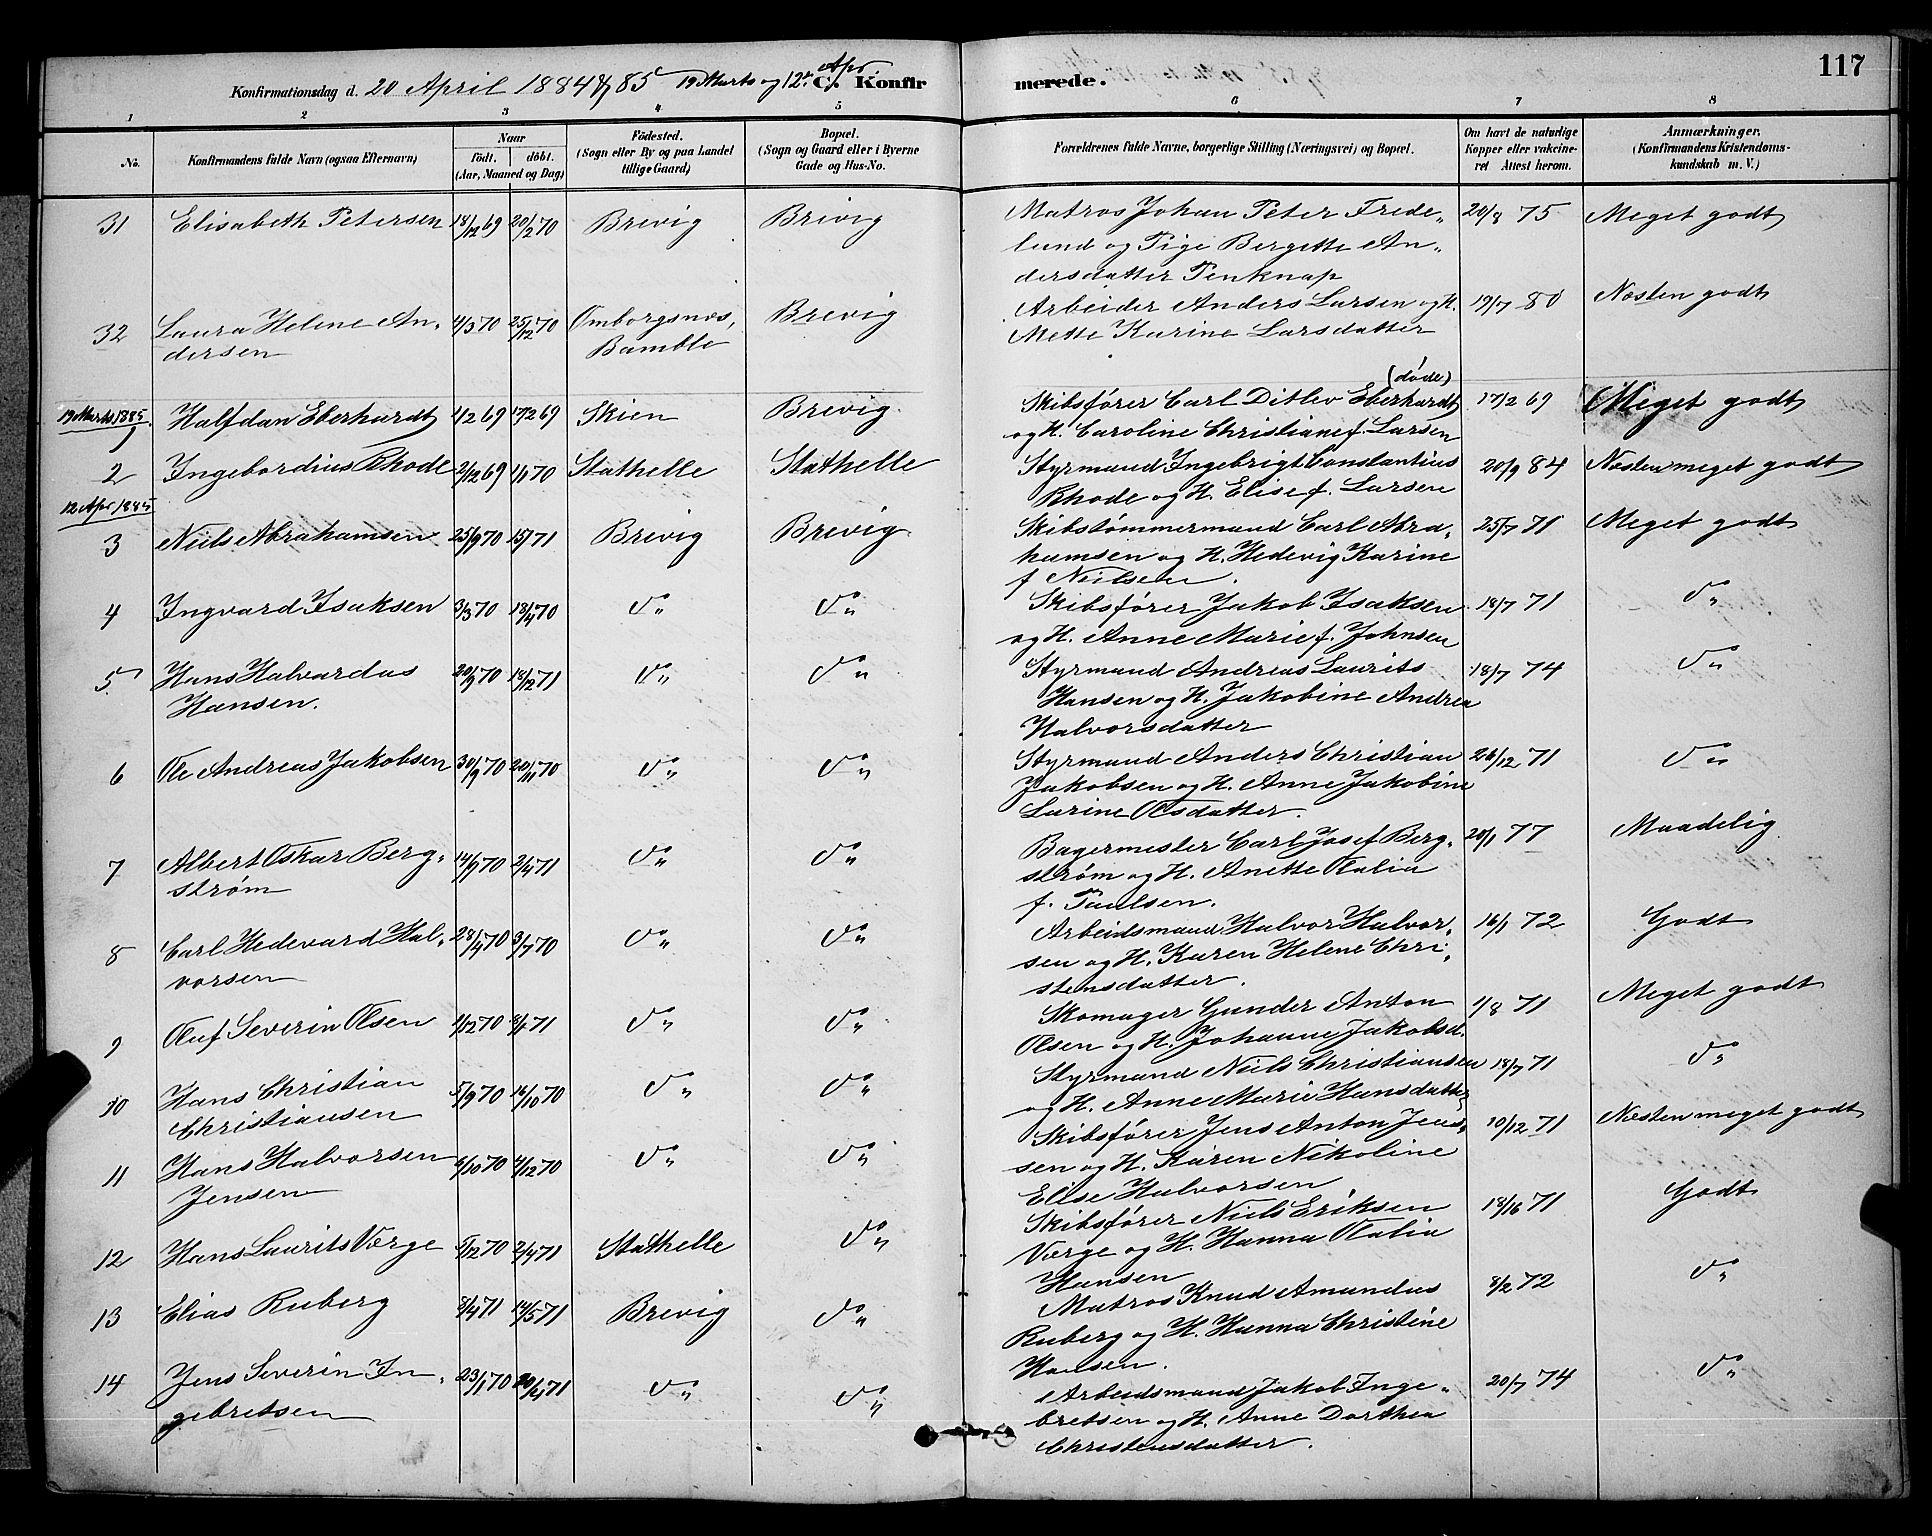 SAKO, Brevik kirkebøker, G/Ga/L0004: Klokkerbok nr. 4, 1882-1900, s. 117